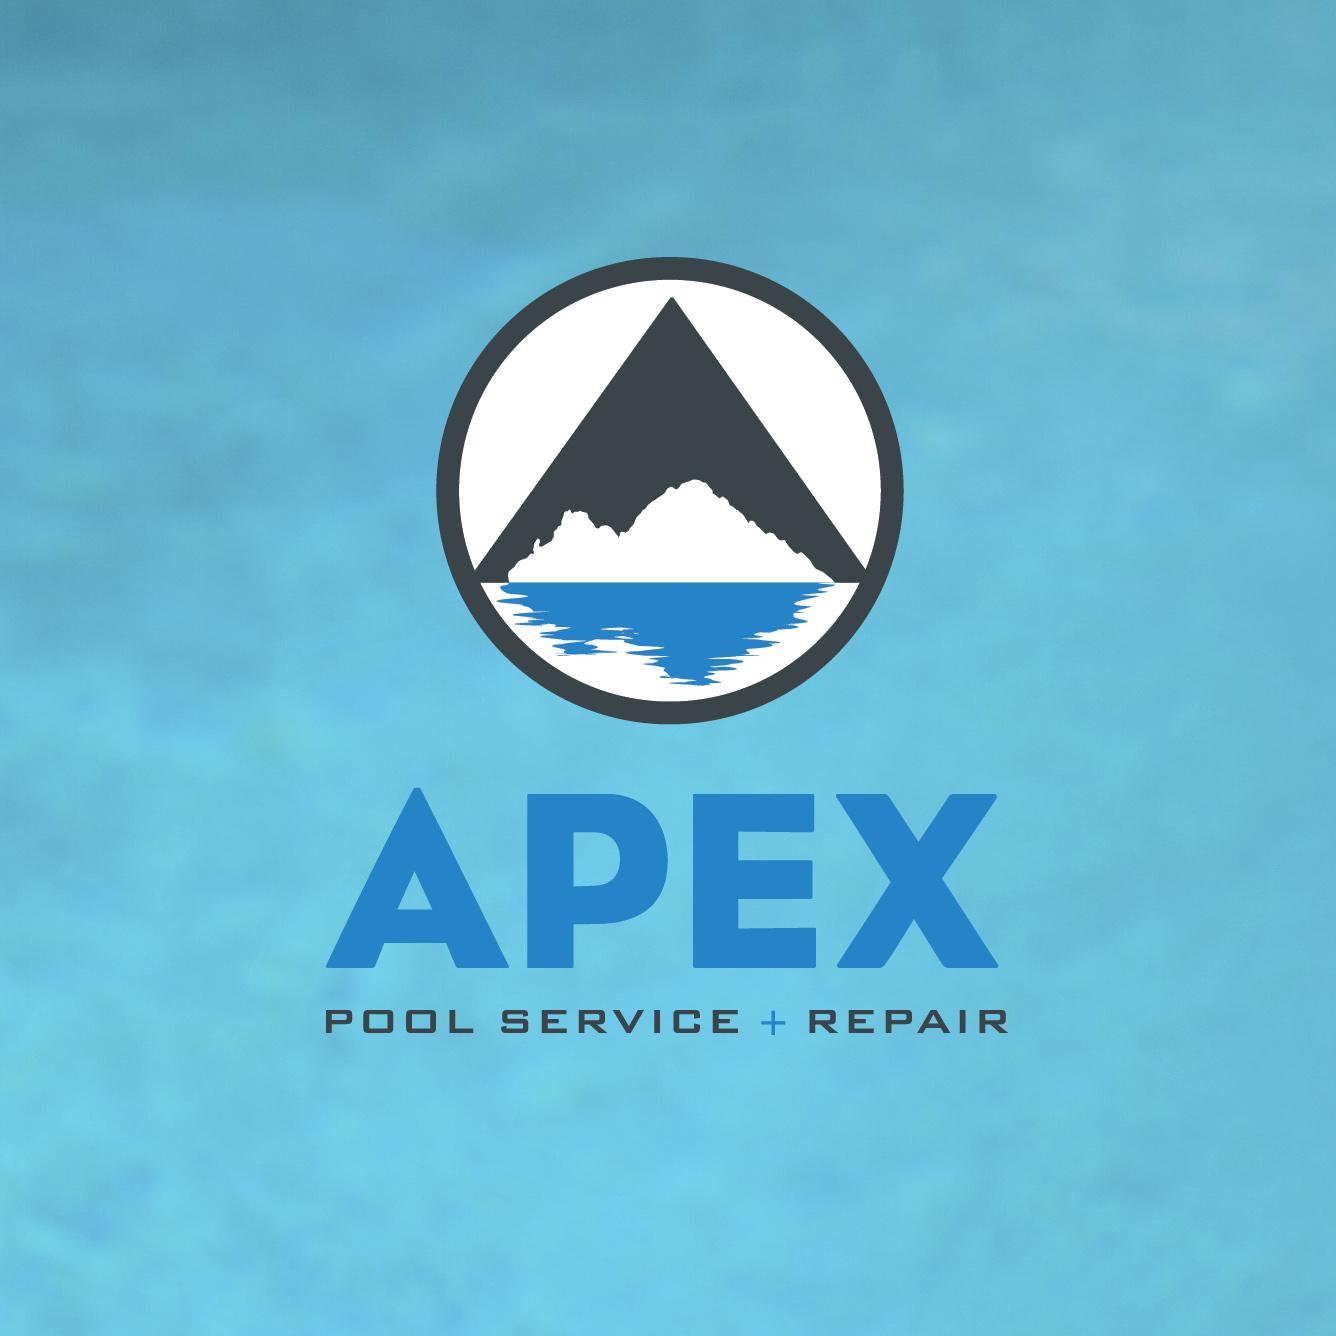 Sommerset Design - Apex Pool Service + Repair